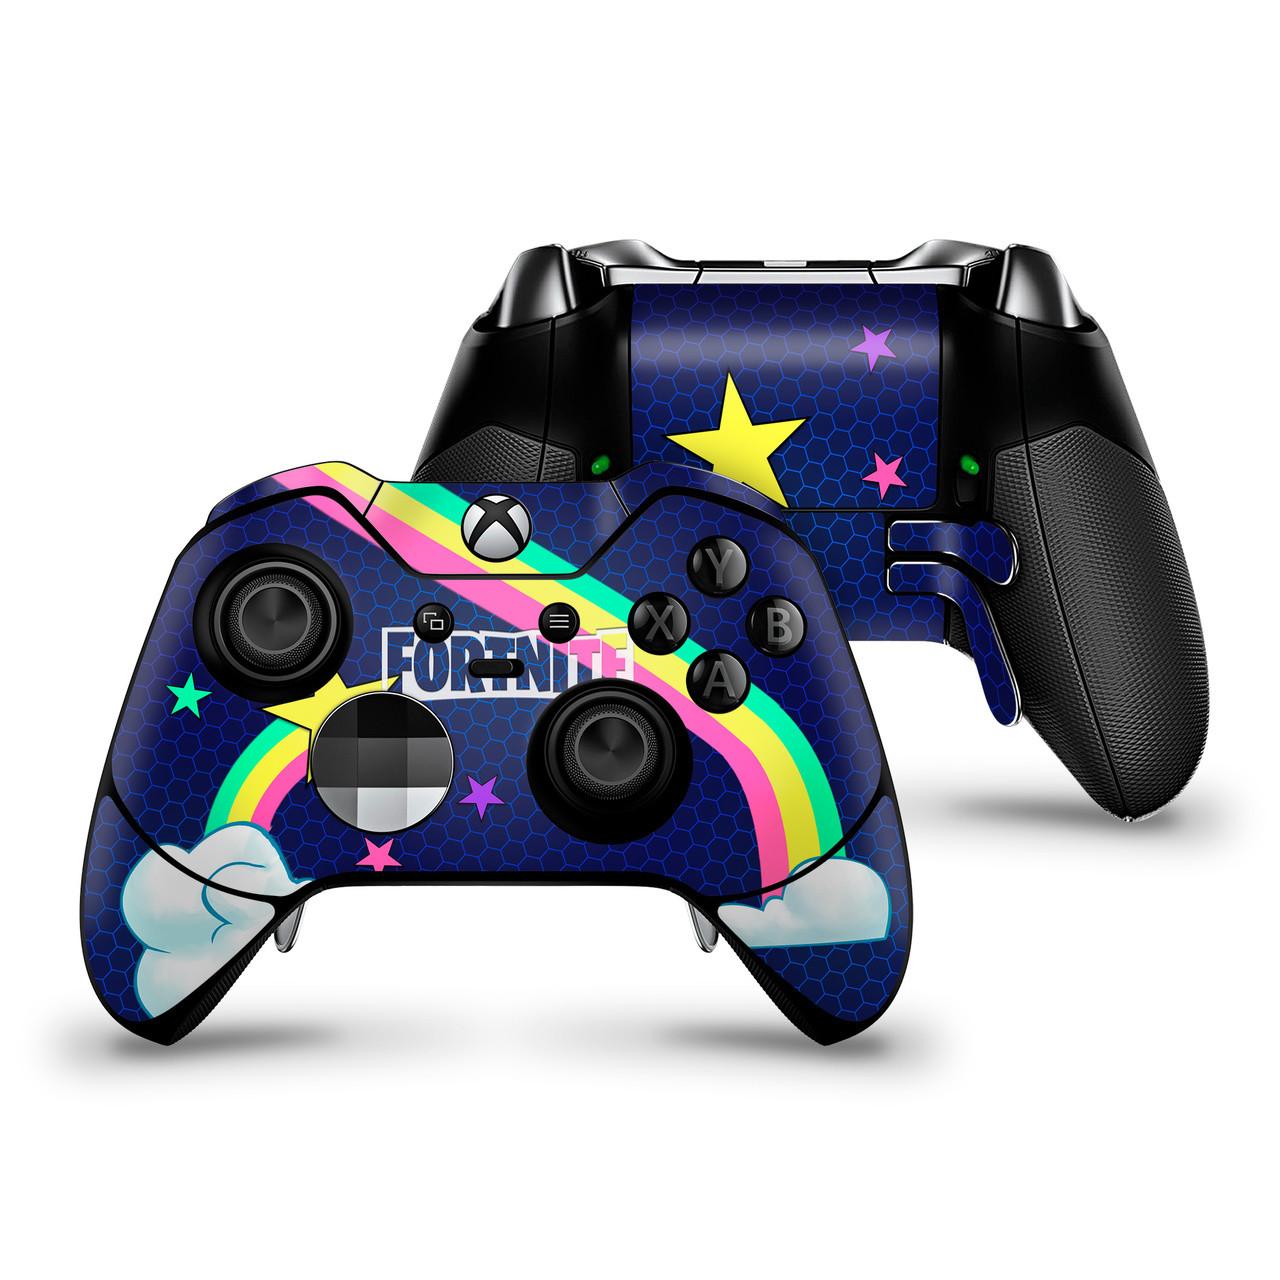 Rainbow Rider Xbox One Elite Controller Skin Xbox One Skins Fortnite